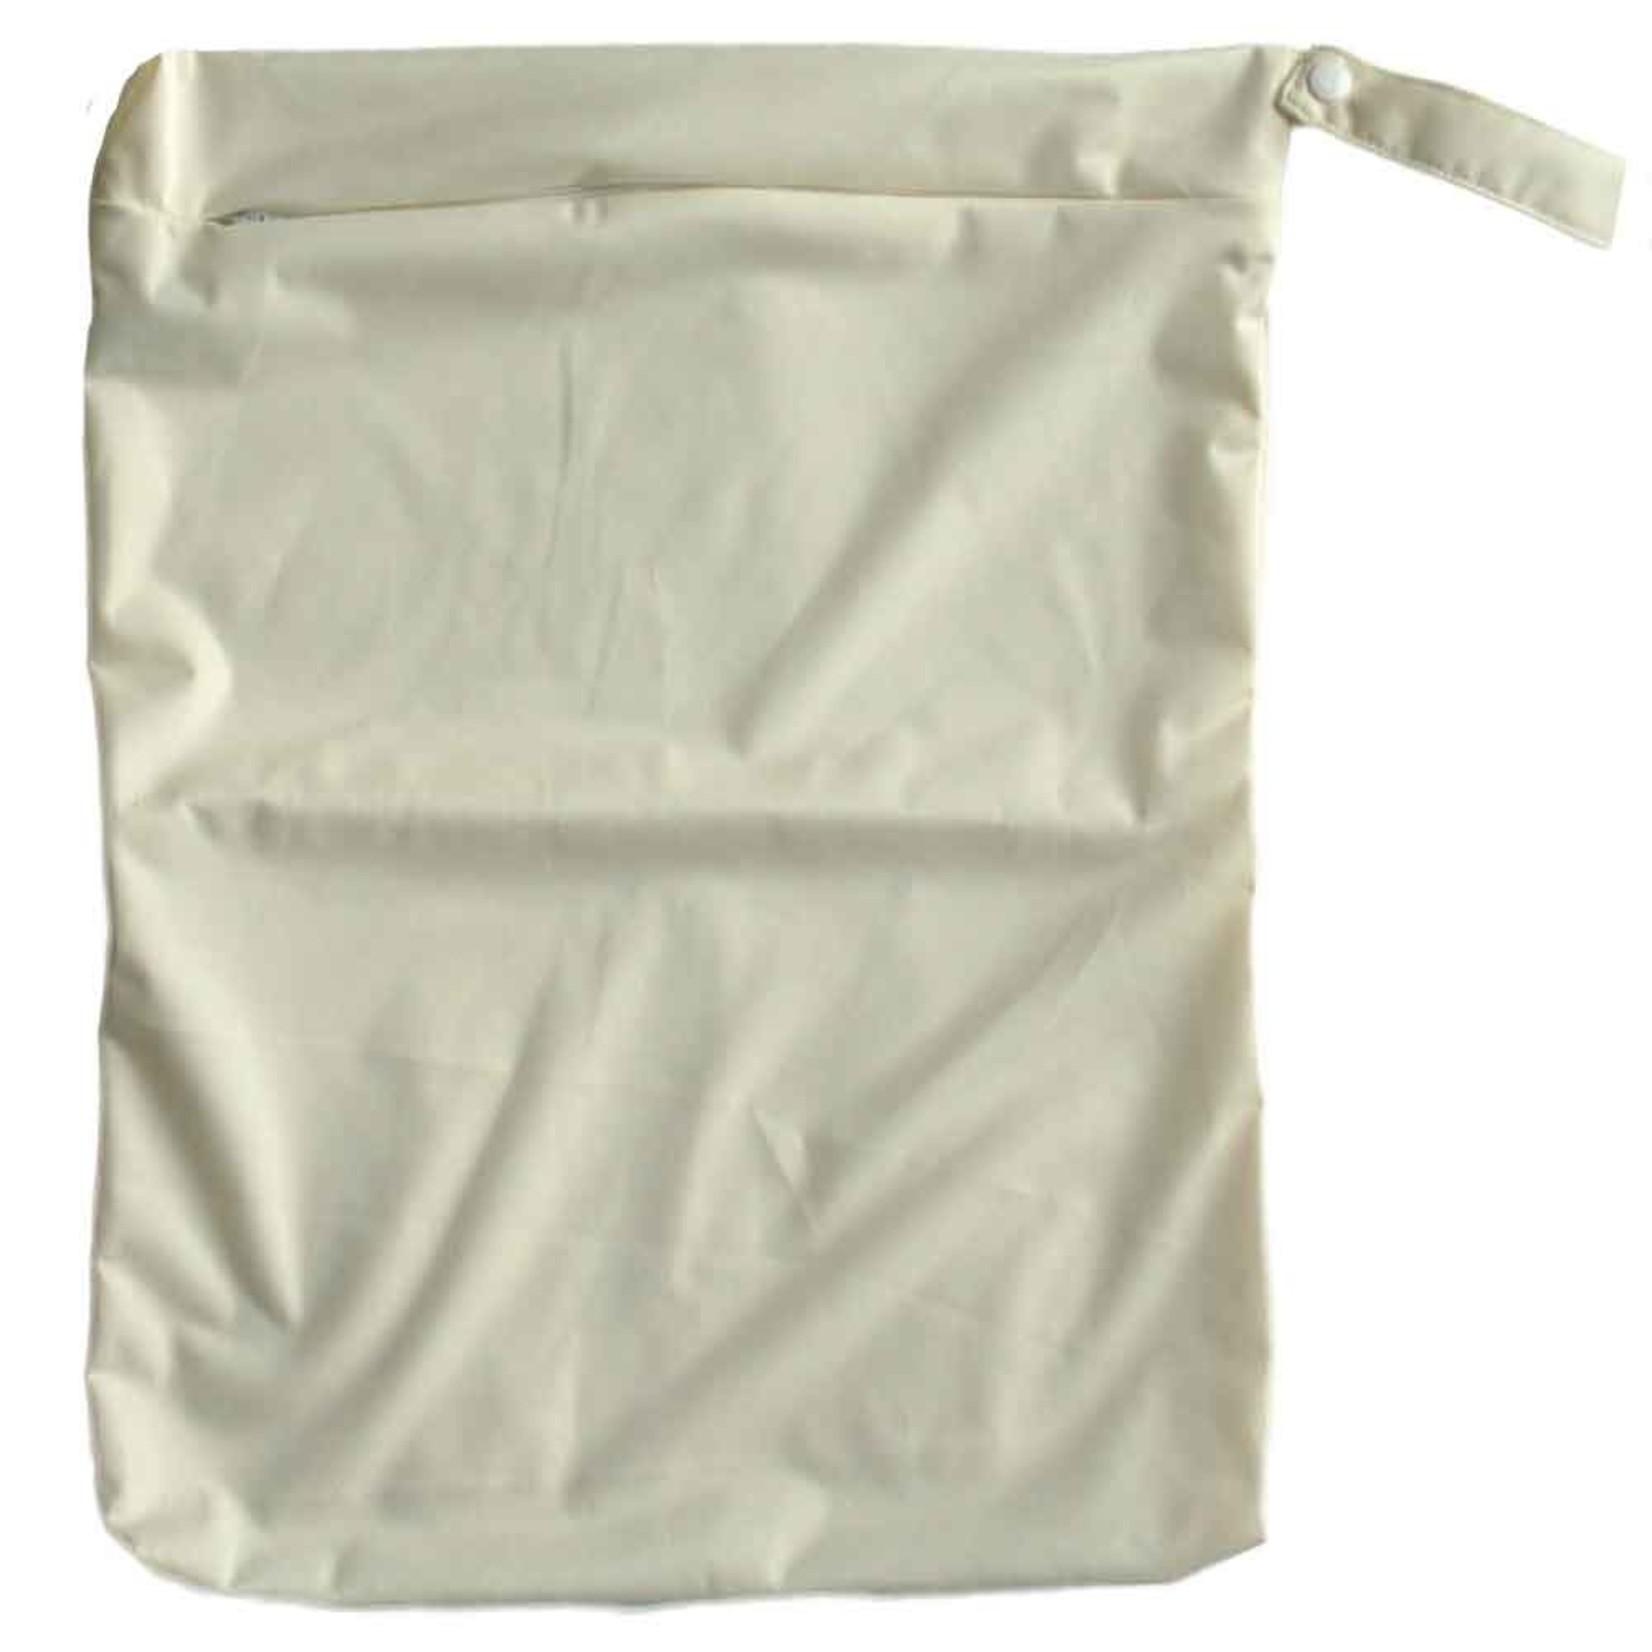 LittleLamb Wetbag Large (Cream)